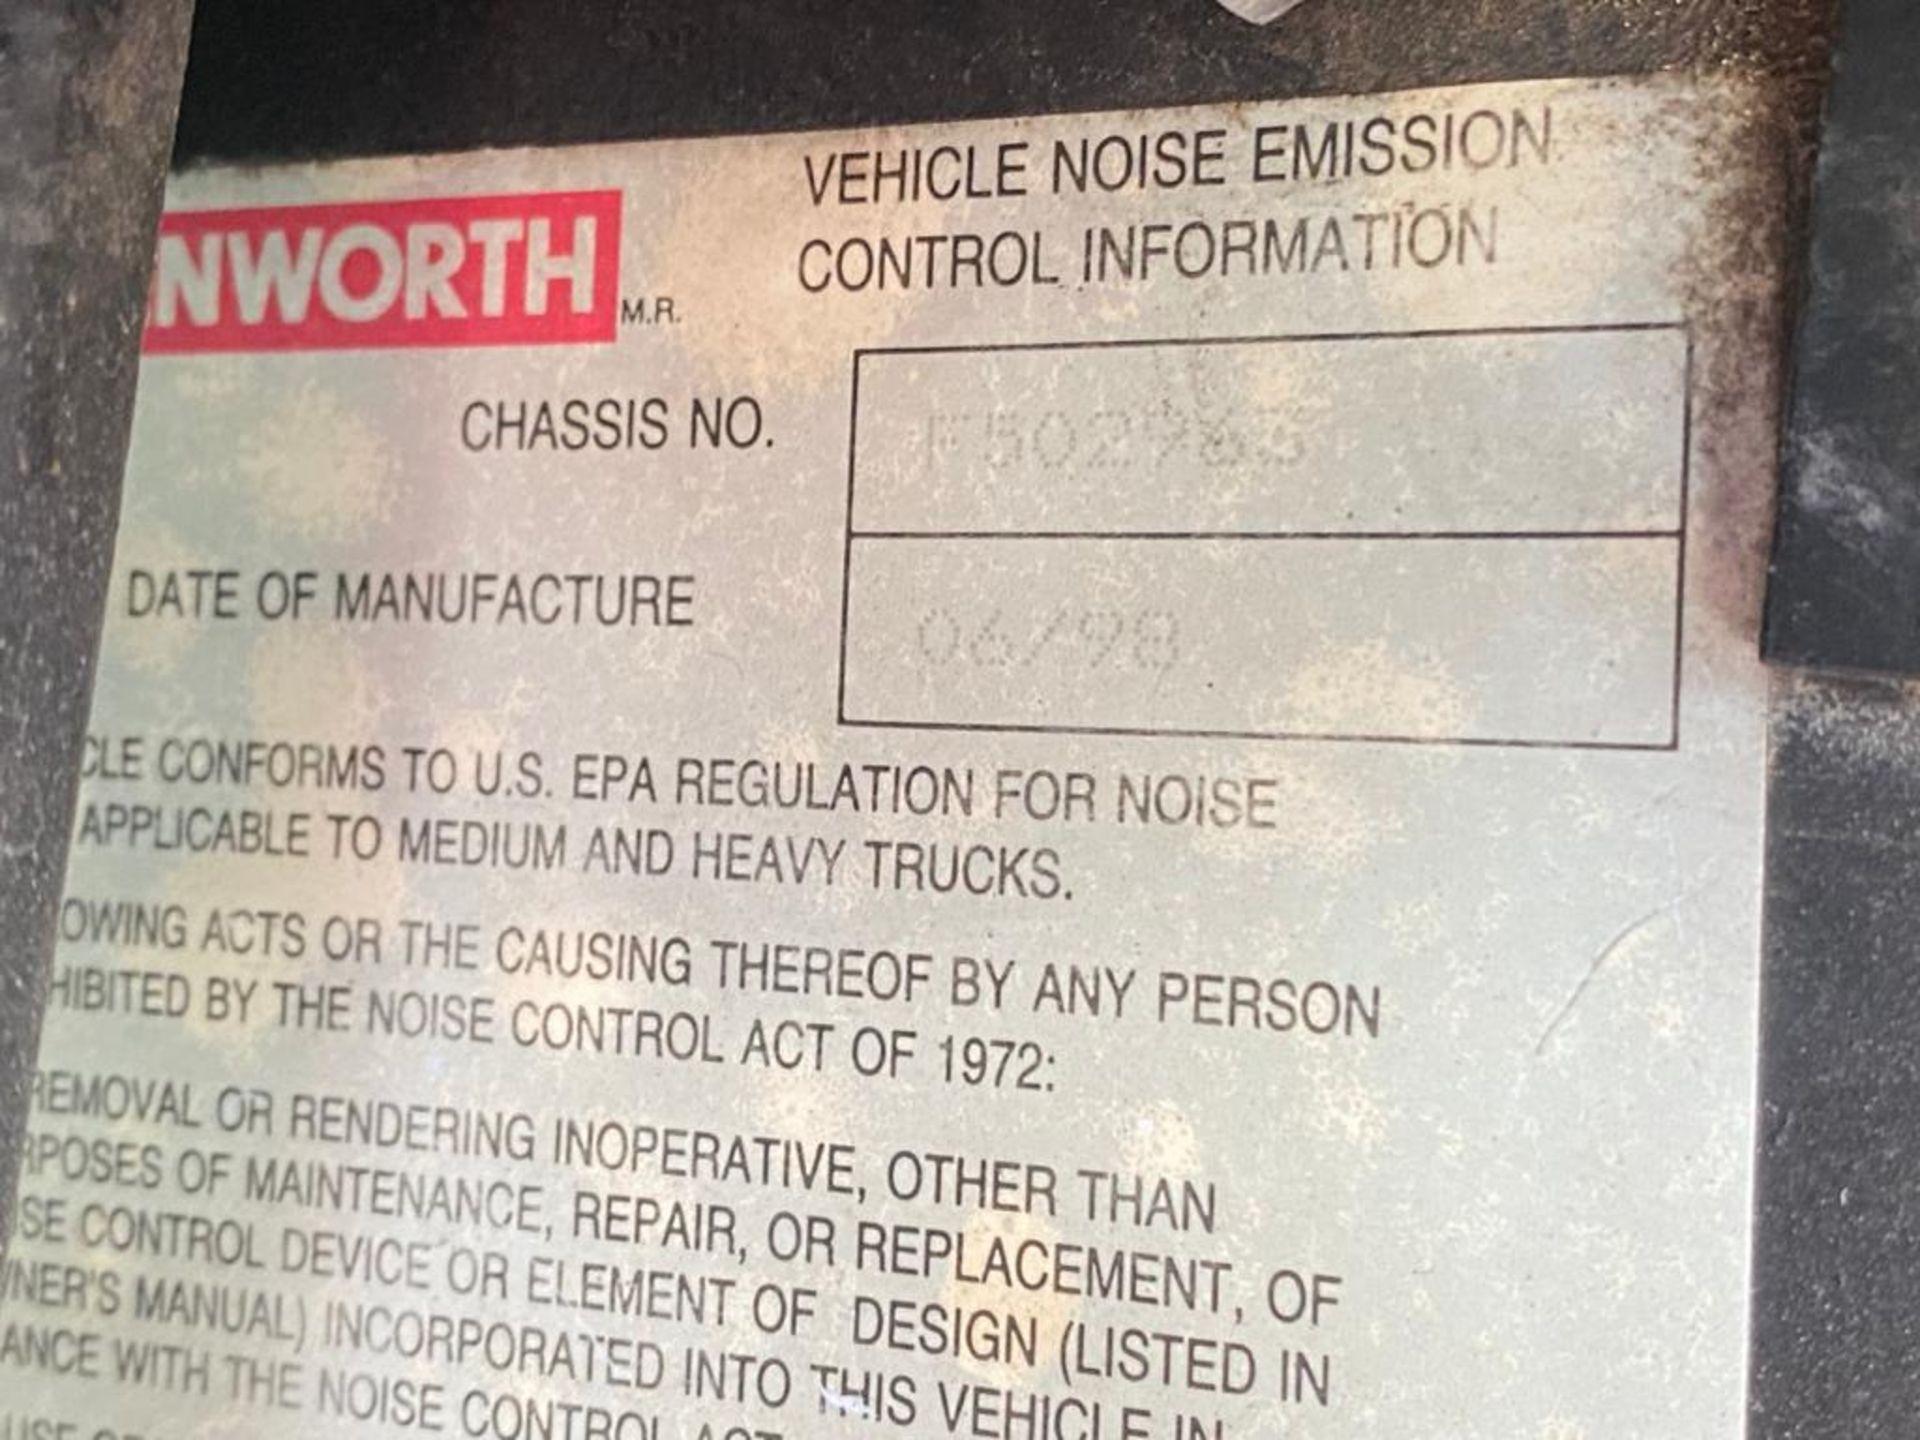 1999 Kenworth Sleeper truck tractor, standard transmission of 18 speeds - Image 43 of 62